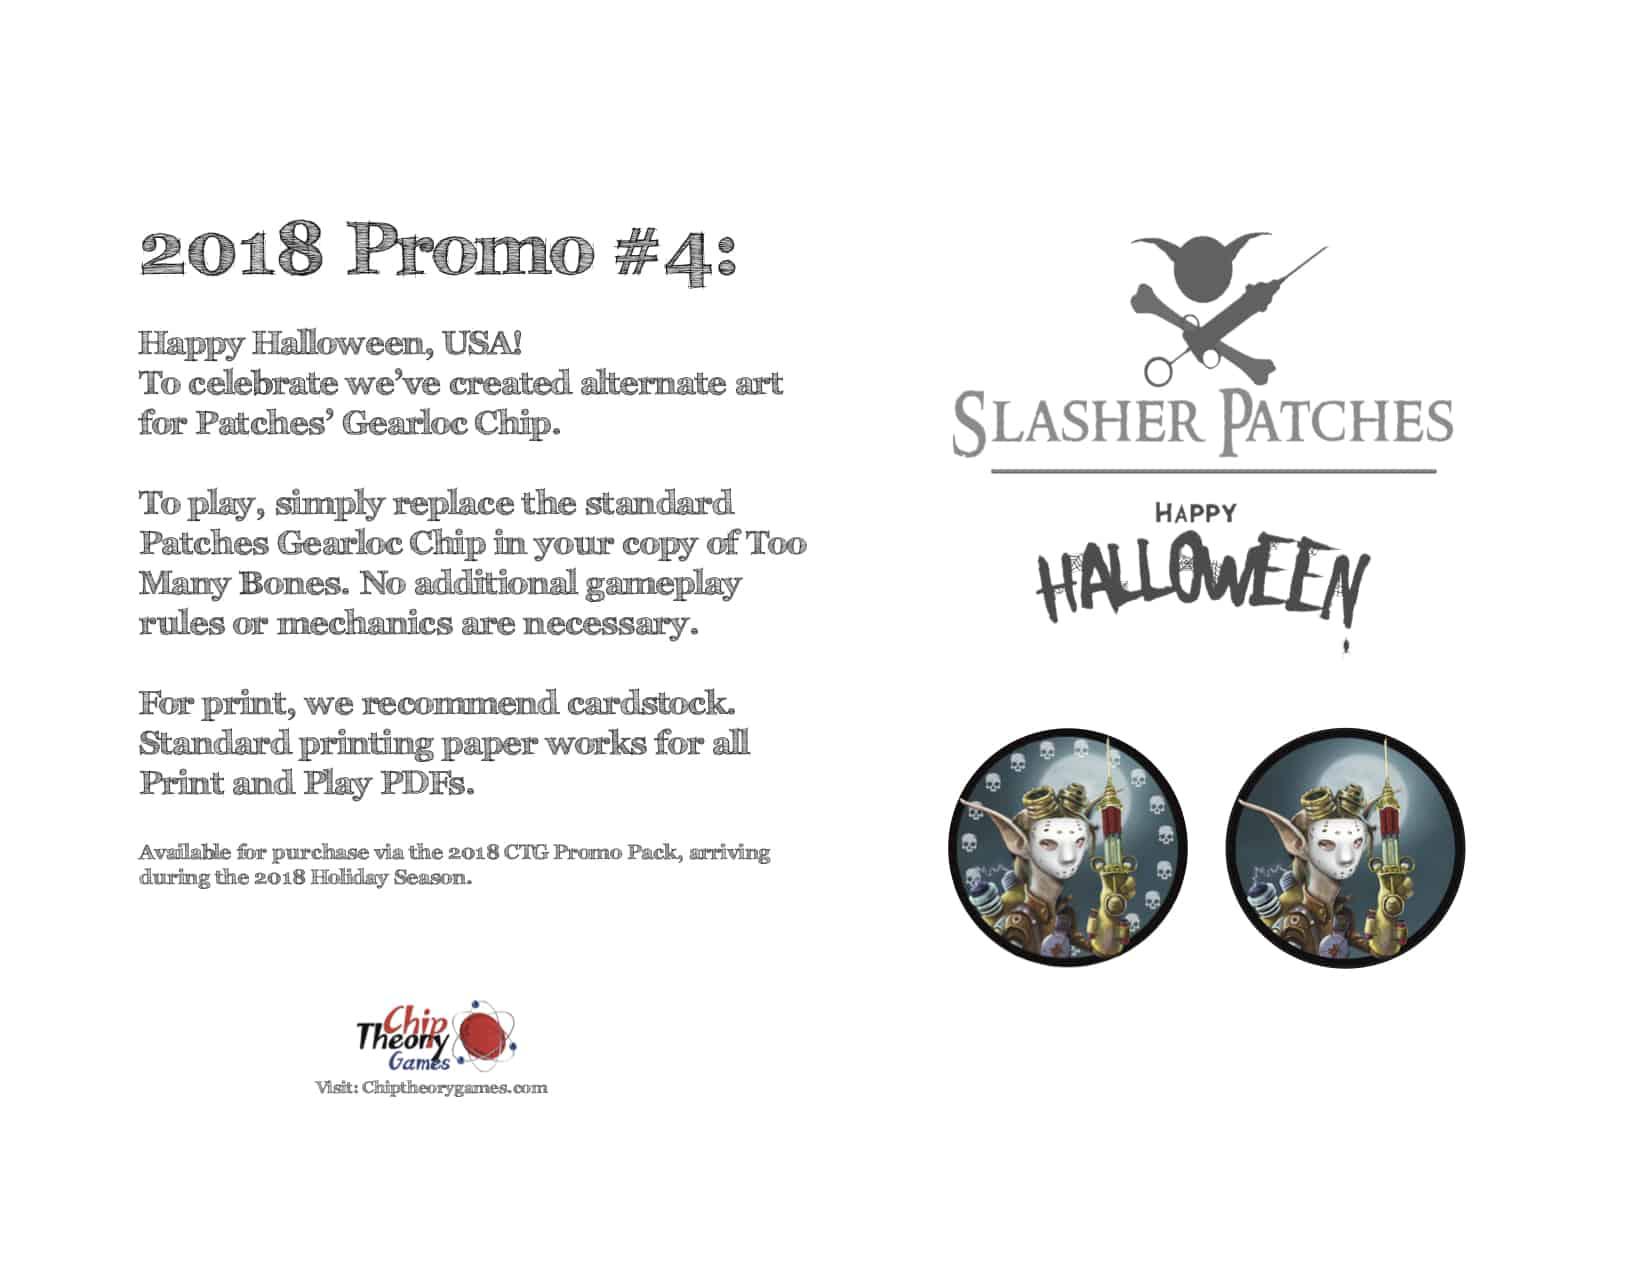 Promo Printout Slasher Patches - Chip2.jpg